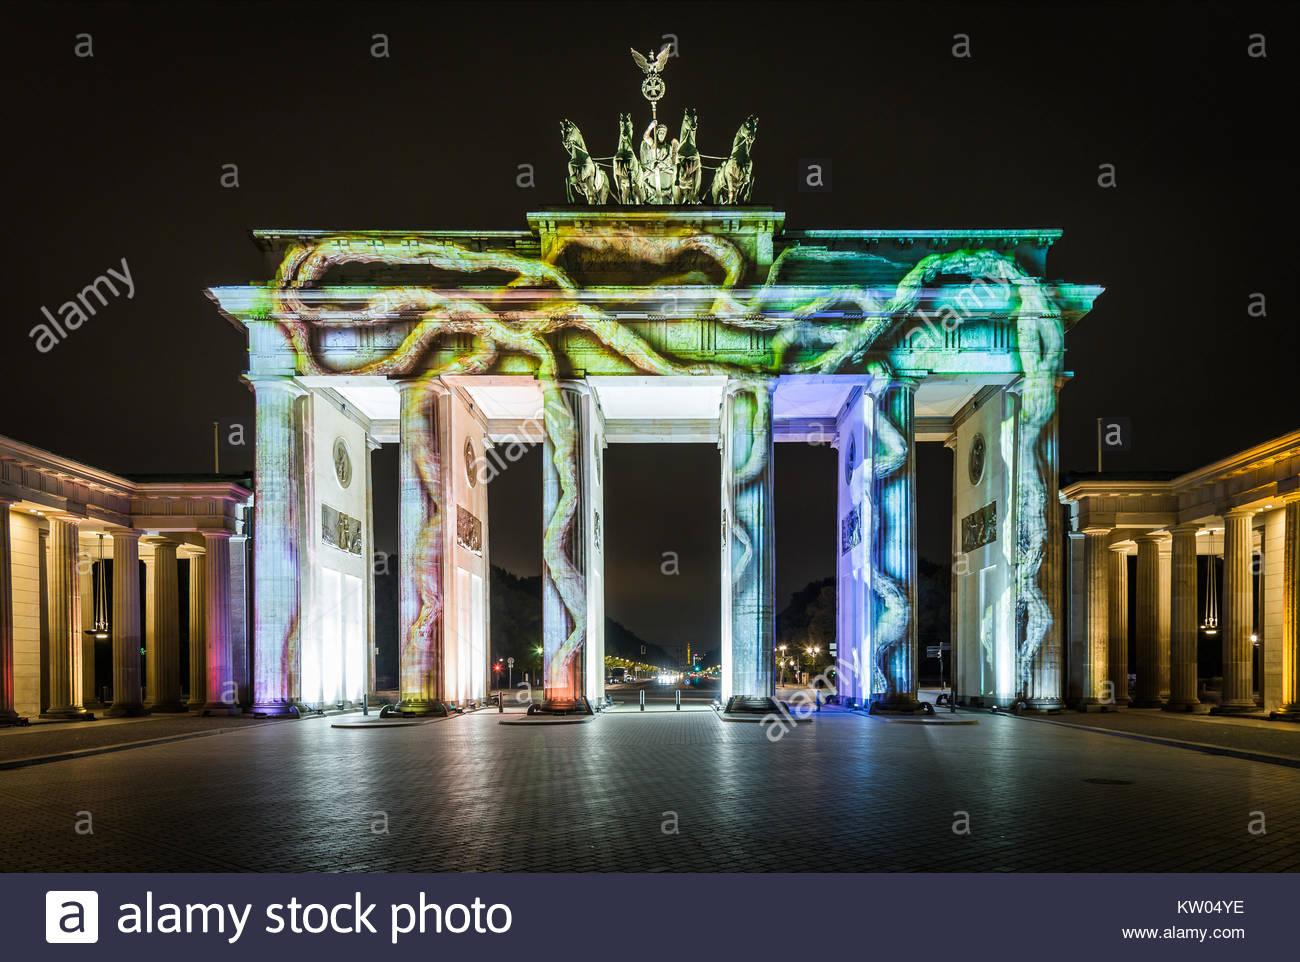 Berlin, das Brandenburger Tor beim Festival of Lights 2016 illuminiert in farbenprächtigen Dekor. Seit 2015 - Stock Image